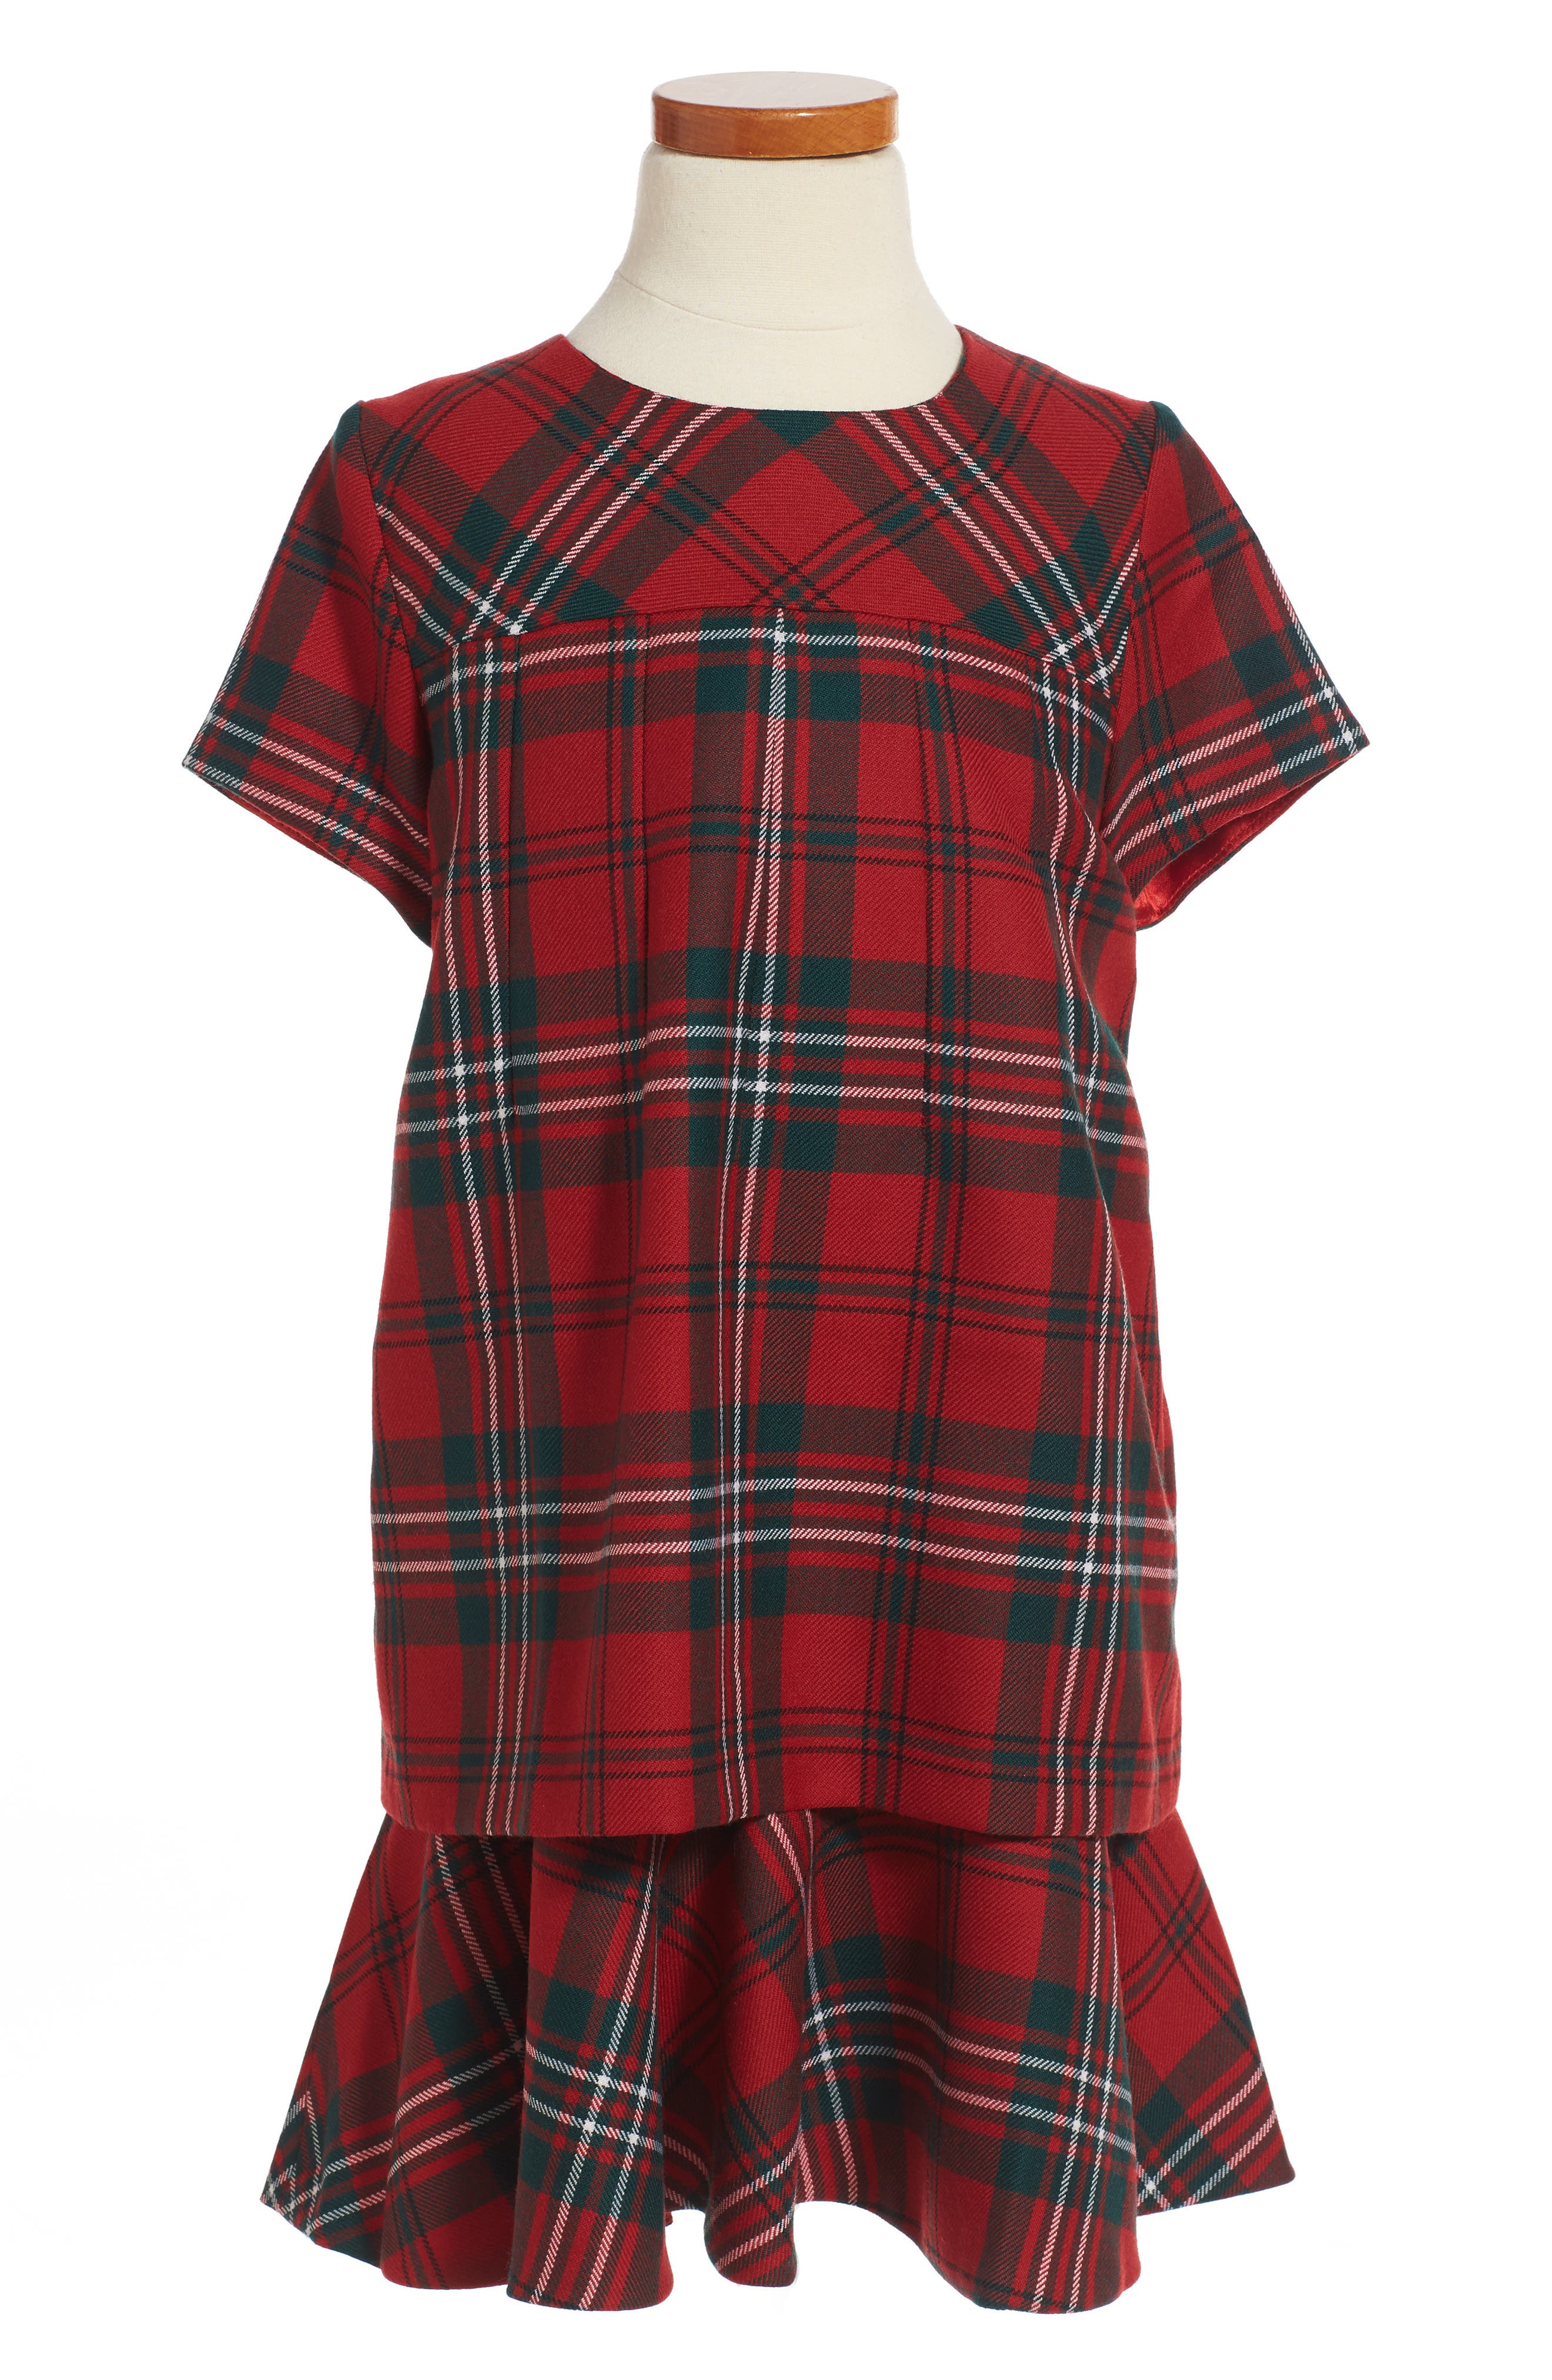 Oscar de la Renta Plaid Wool Dress (Big Girls)